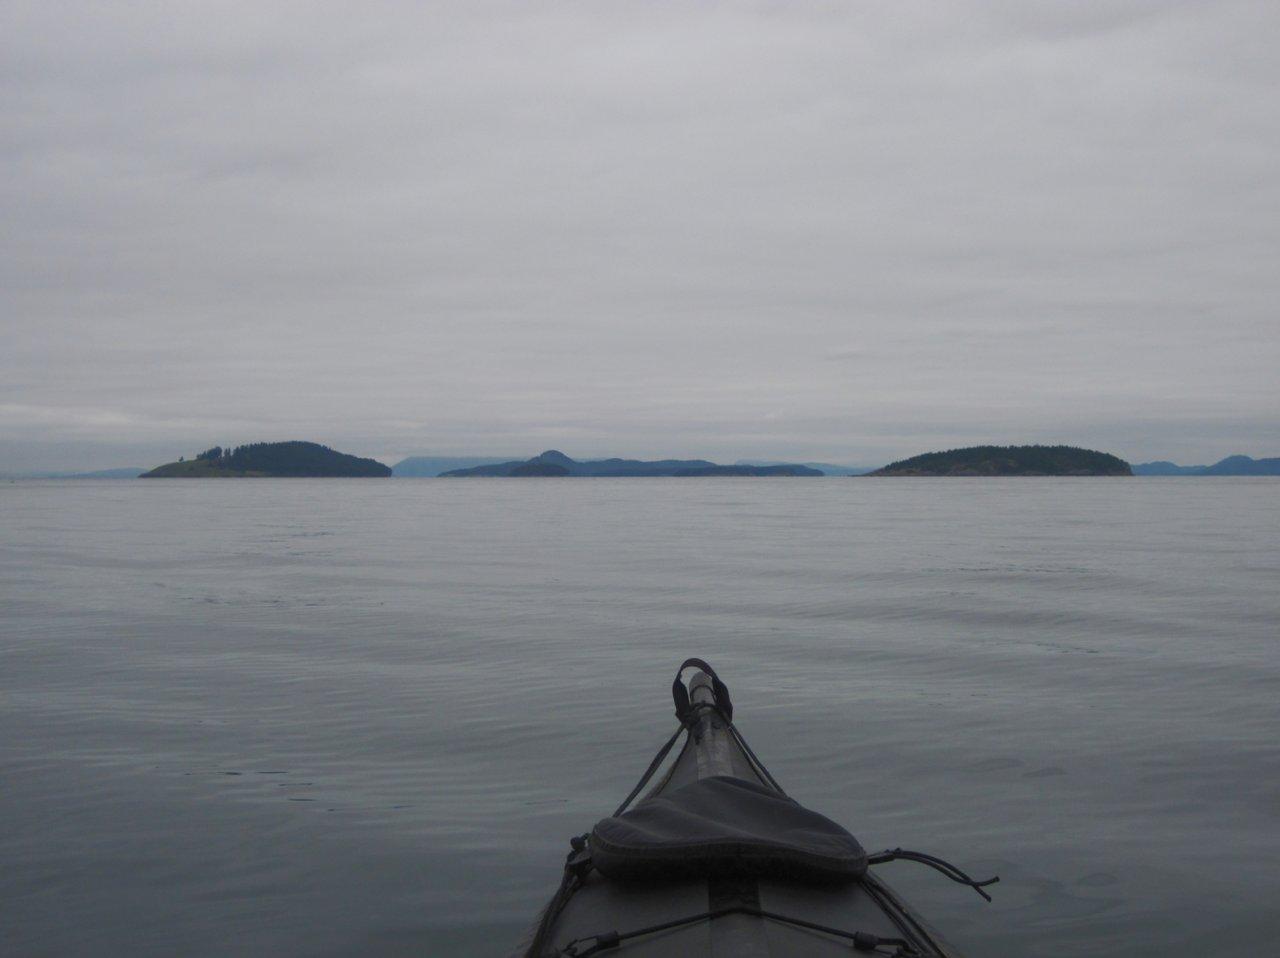 09 Looking west toward Spieden Island and Gulf Islands.JPG